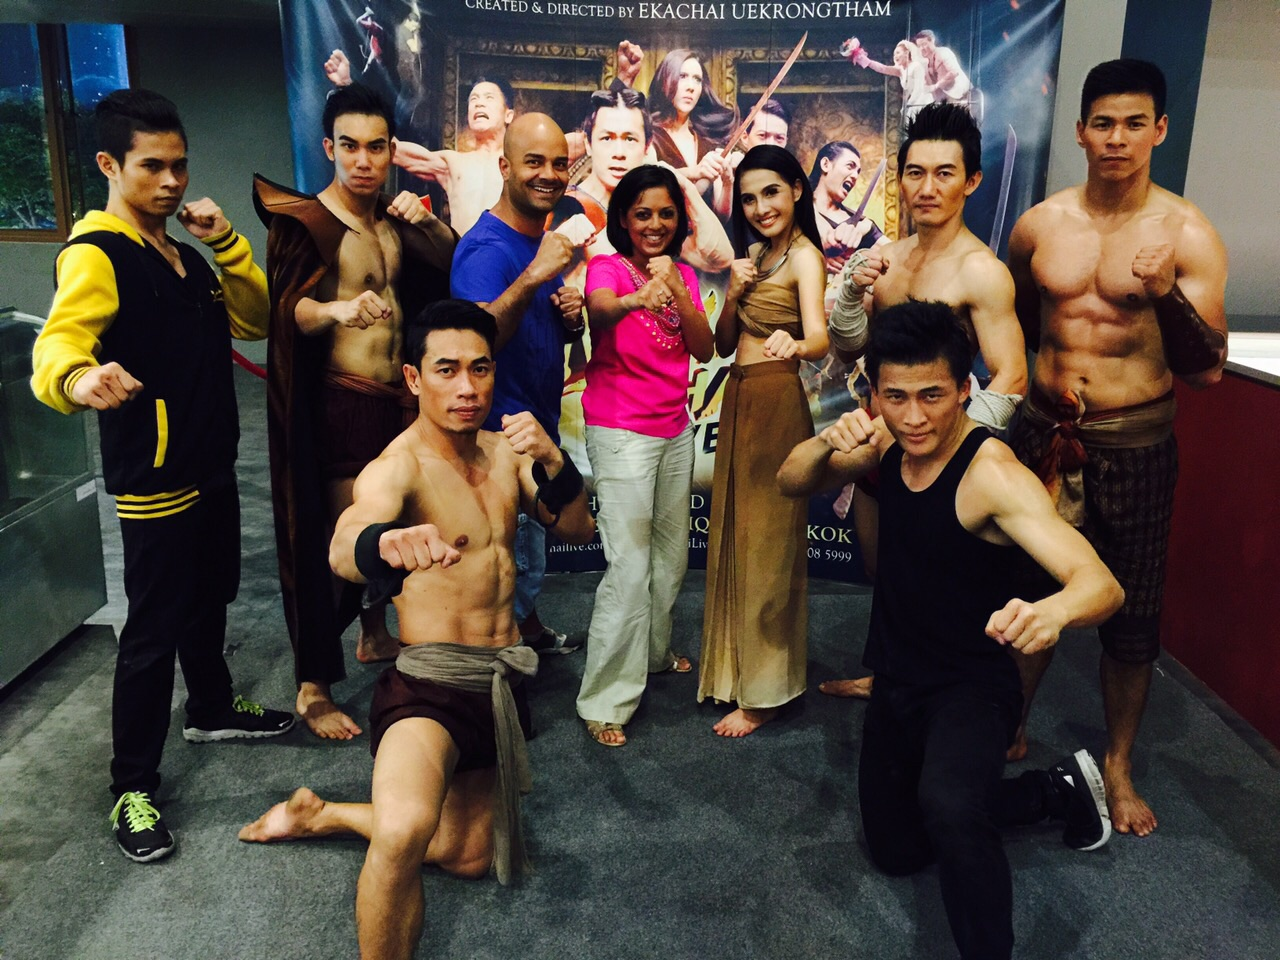 Muy Thai Live - Boxing Show at Asiatique, Bangkok, Thailand